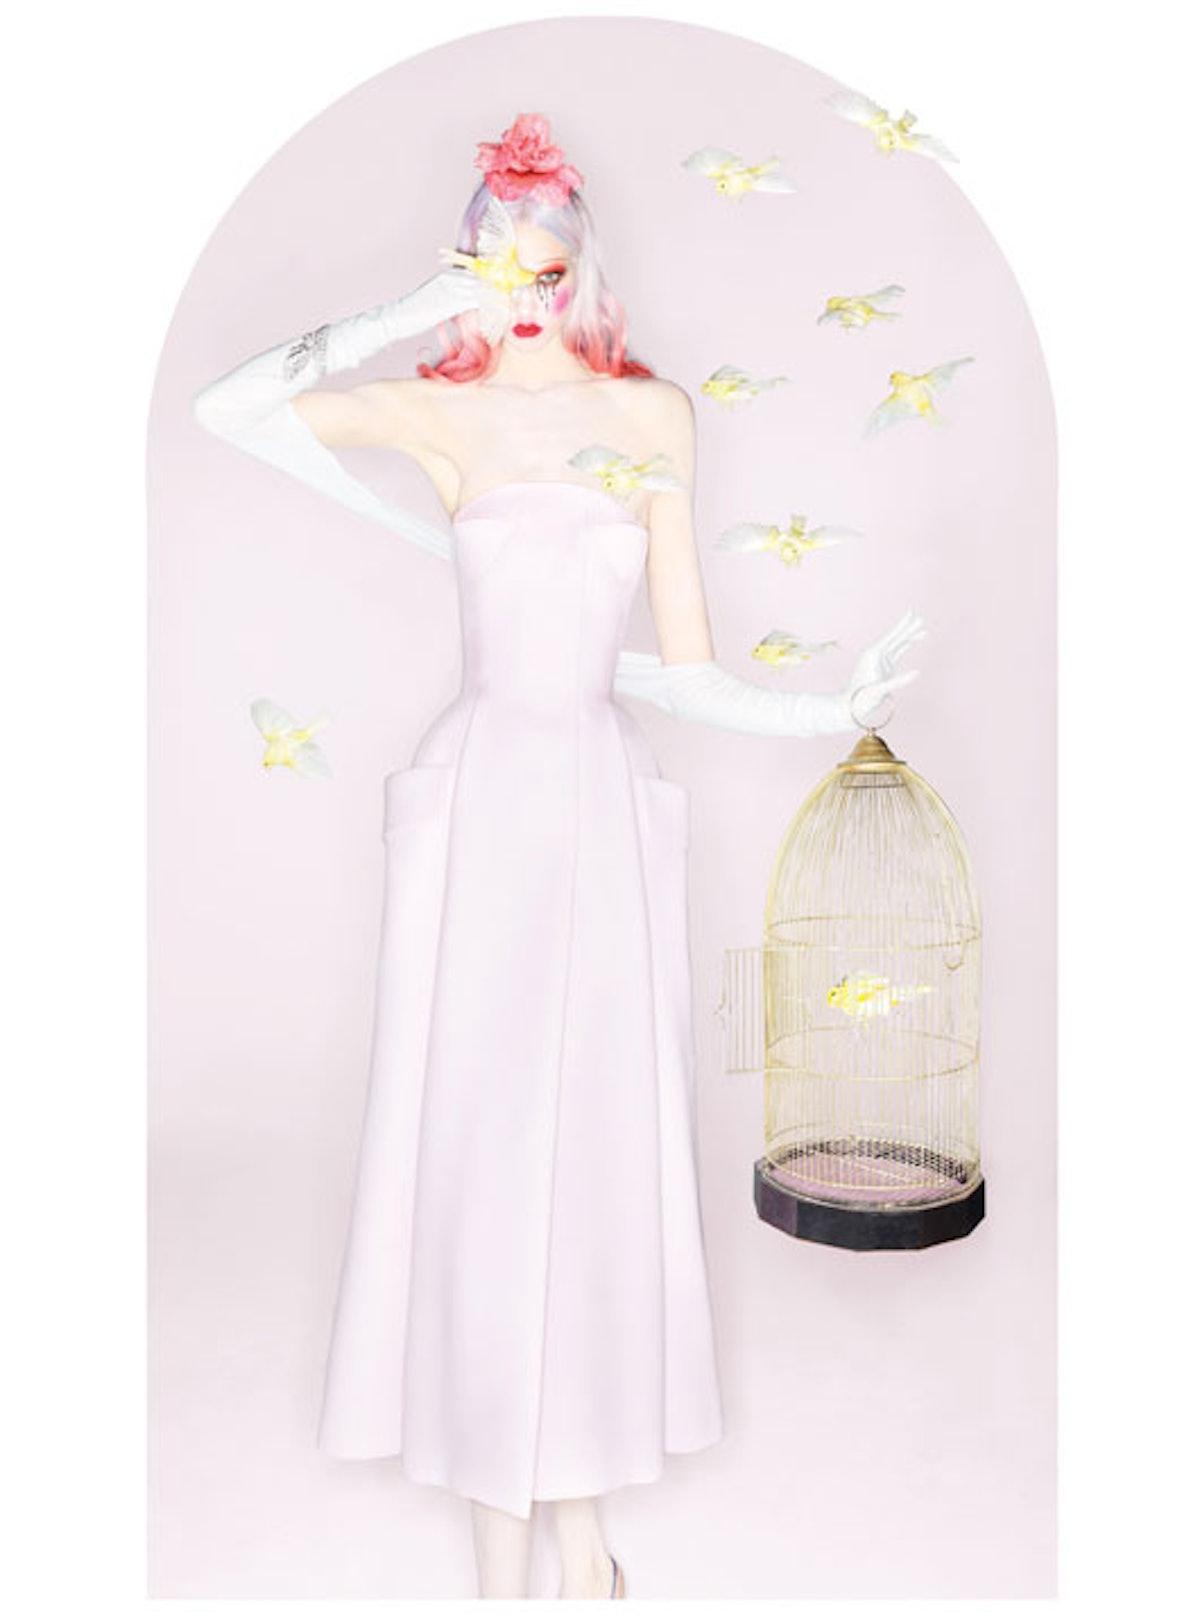 fass-nick-night-couture-02-l.jpg